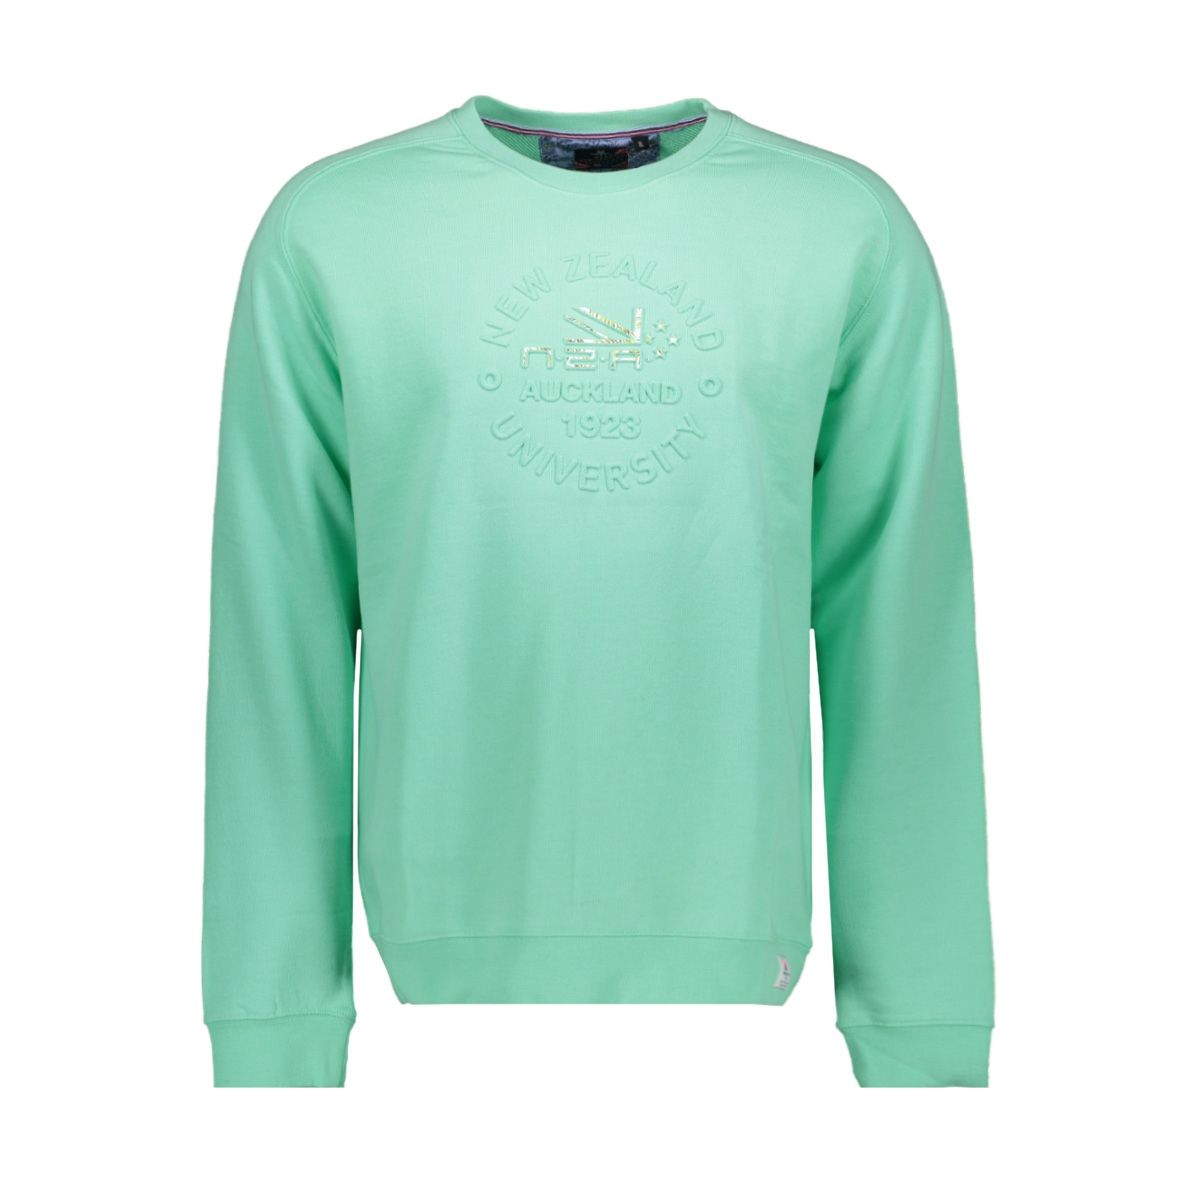 makikihi 19bn305 nza sweater 468 neon green